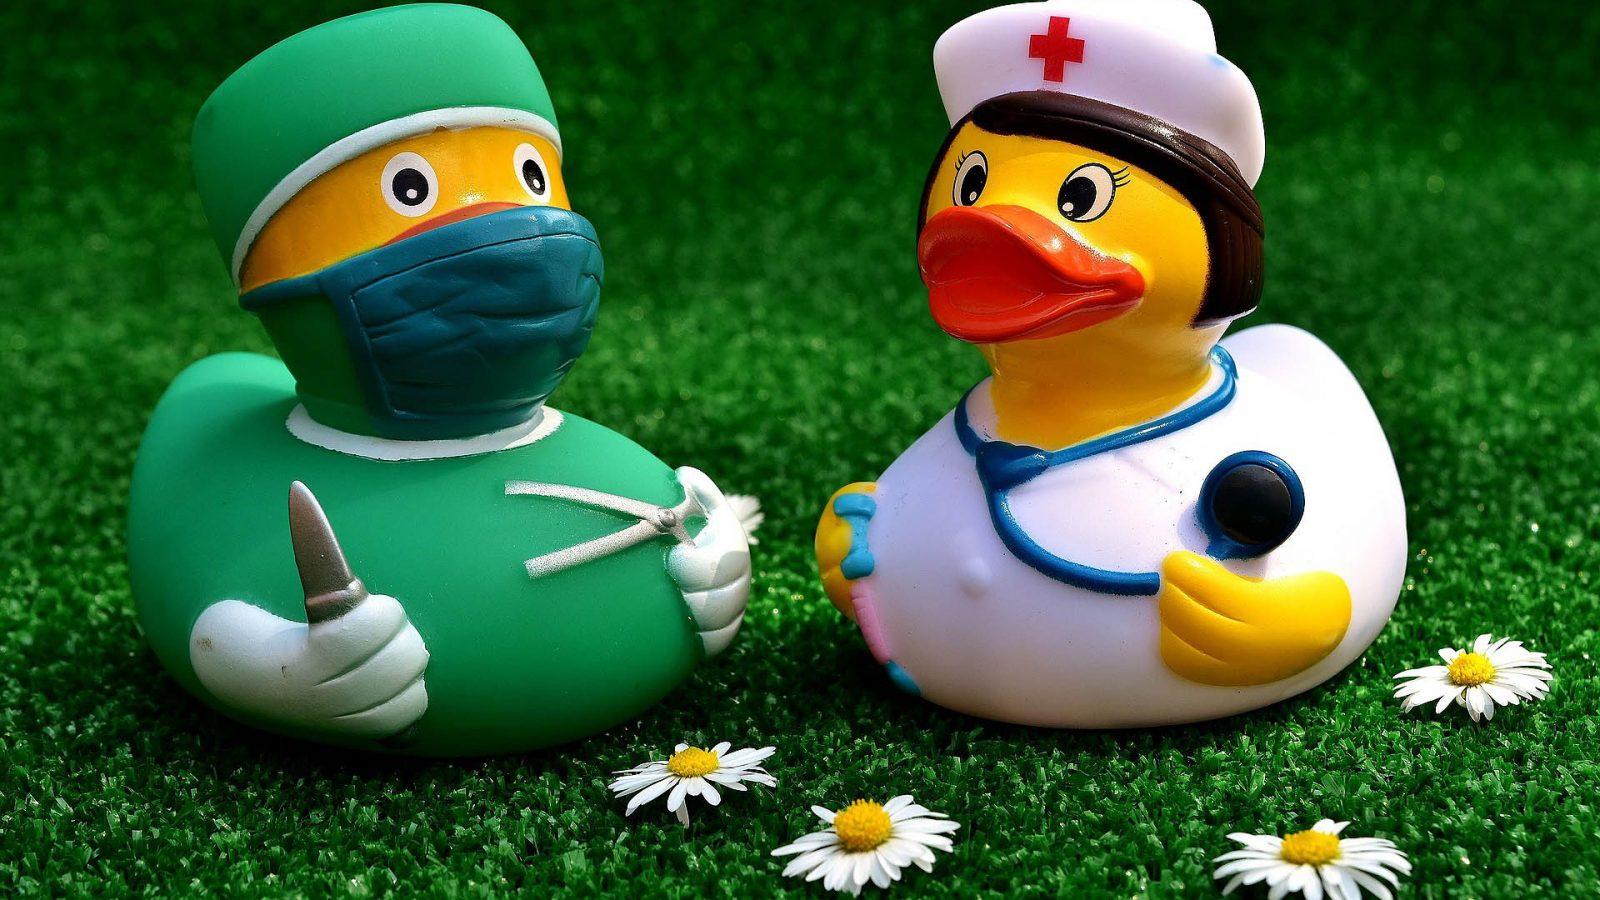 nurse gifts - nurse rubber duckies